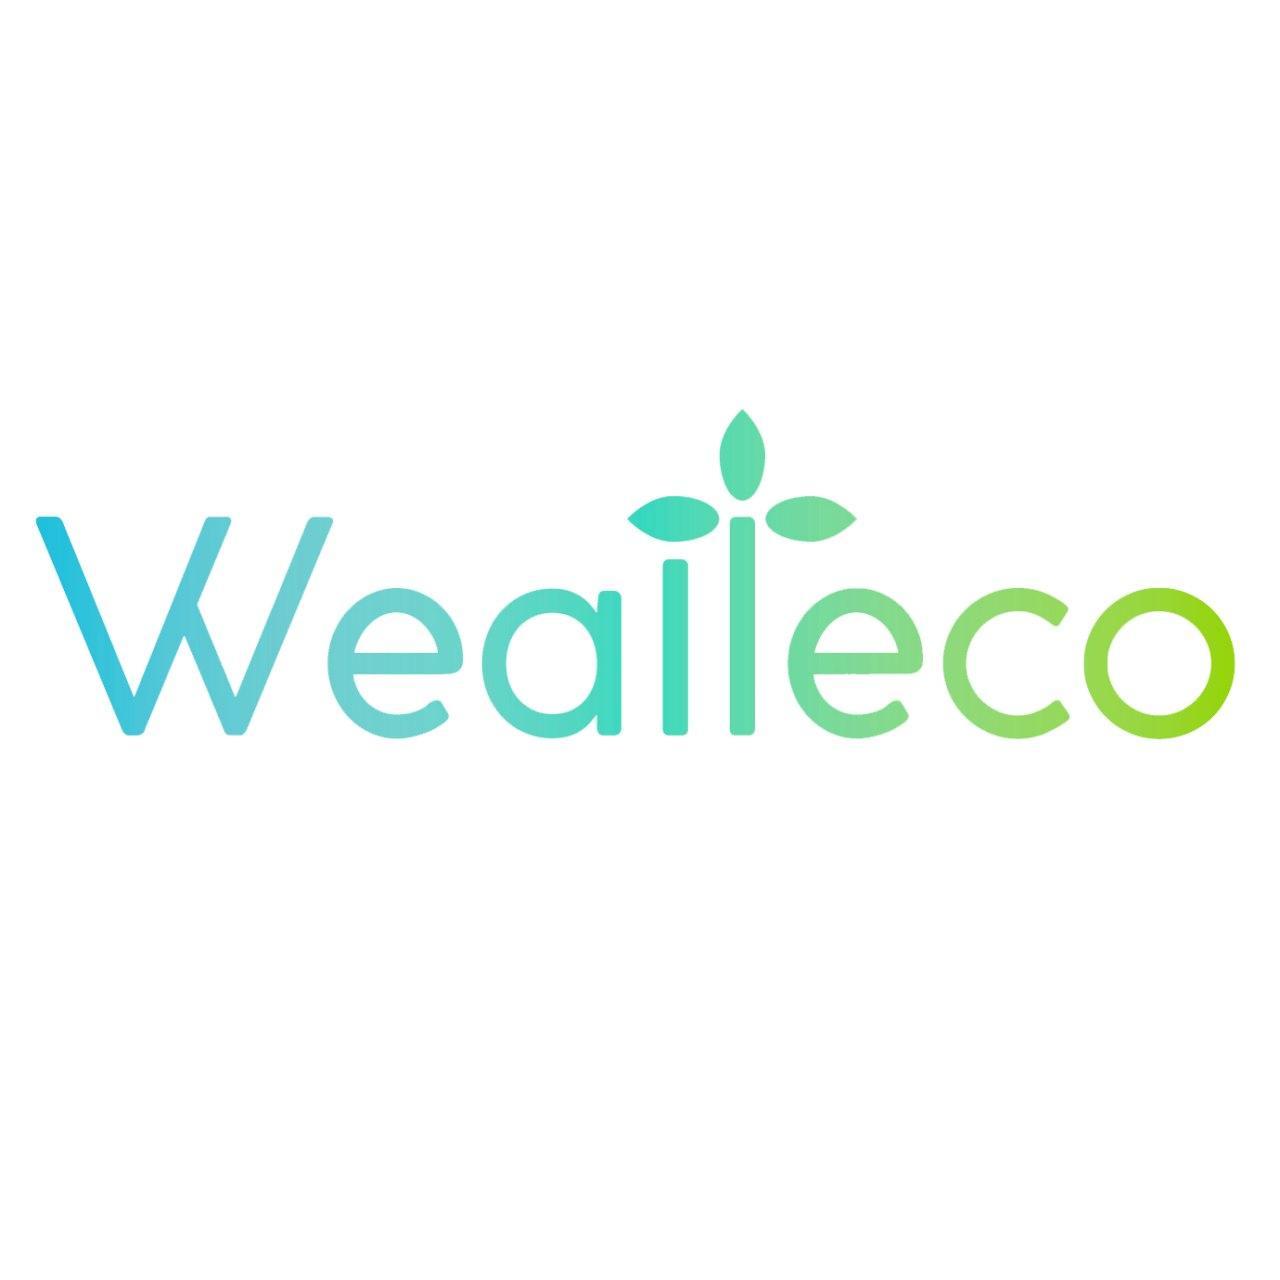 Wealleco